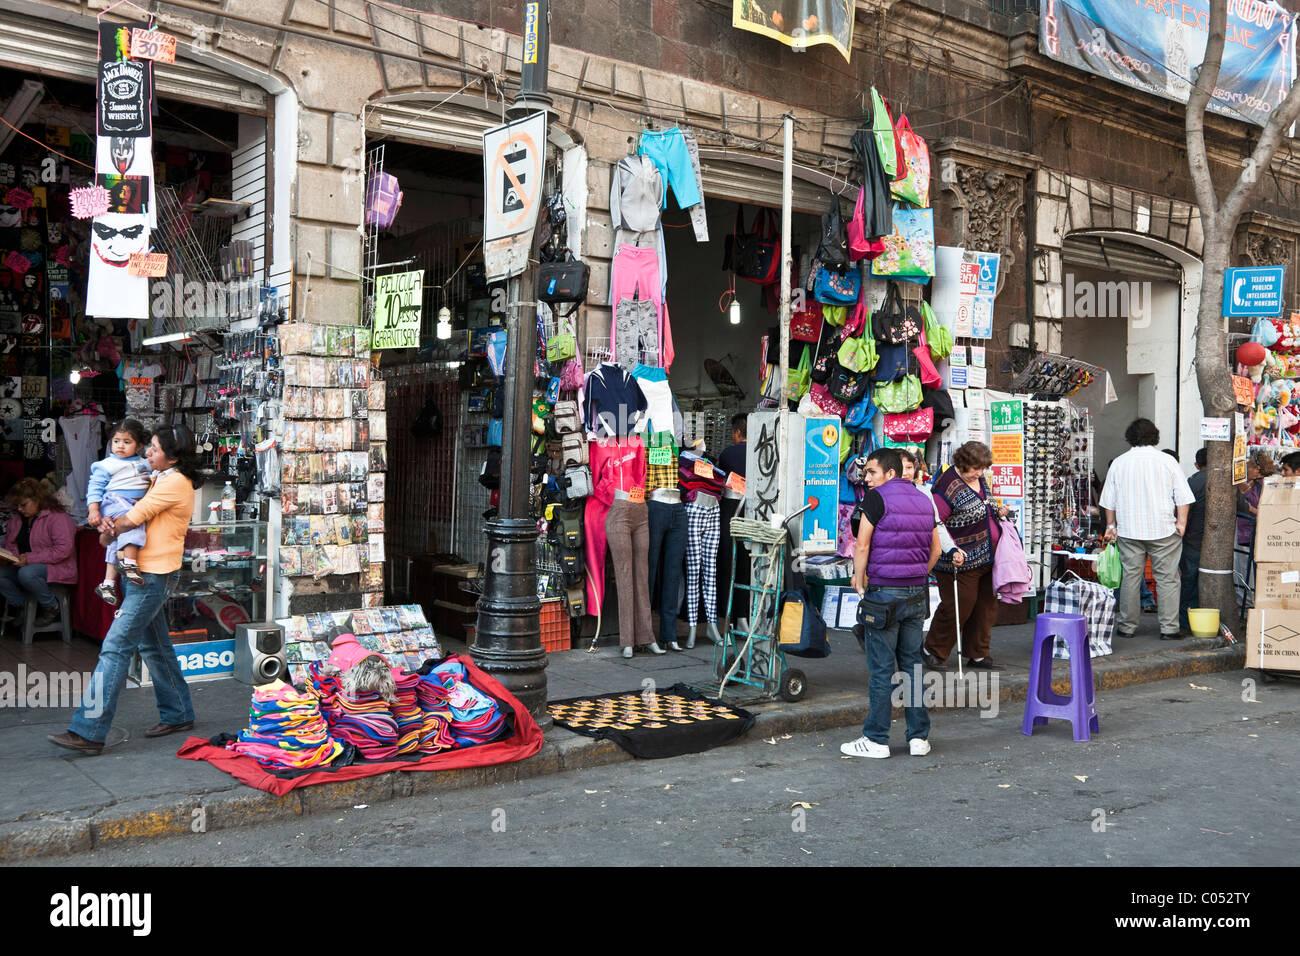 incredible street bazaar jumble energy chaotic scene of Avenida Republica Argentina in centro district Mexico City - Stock Image